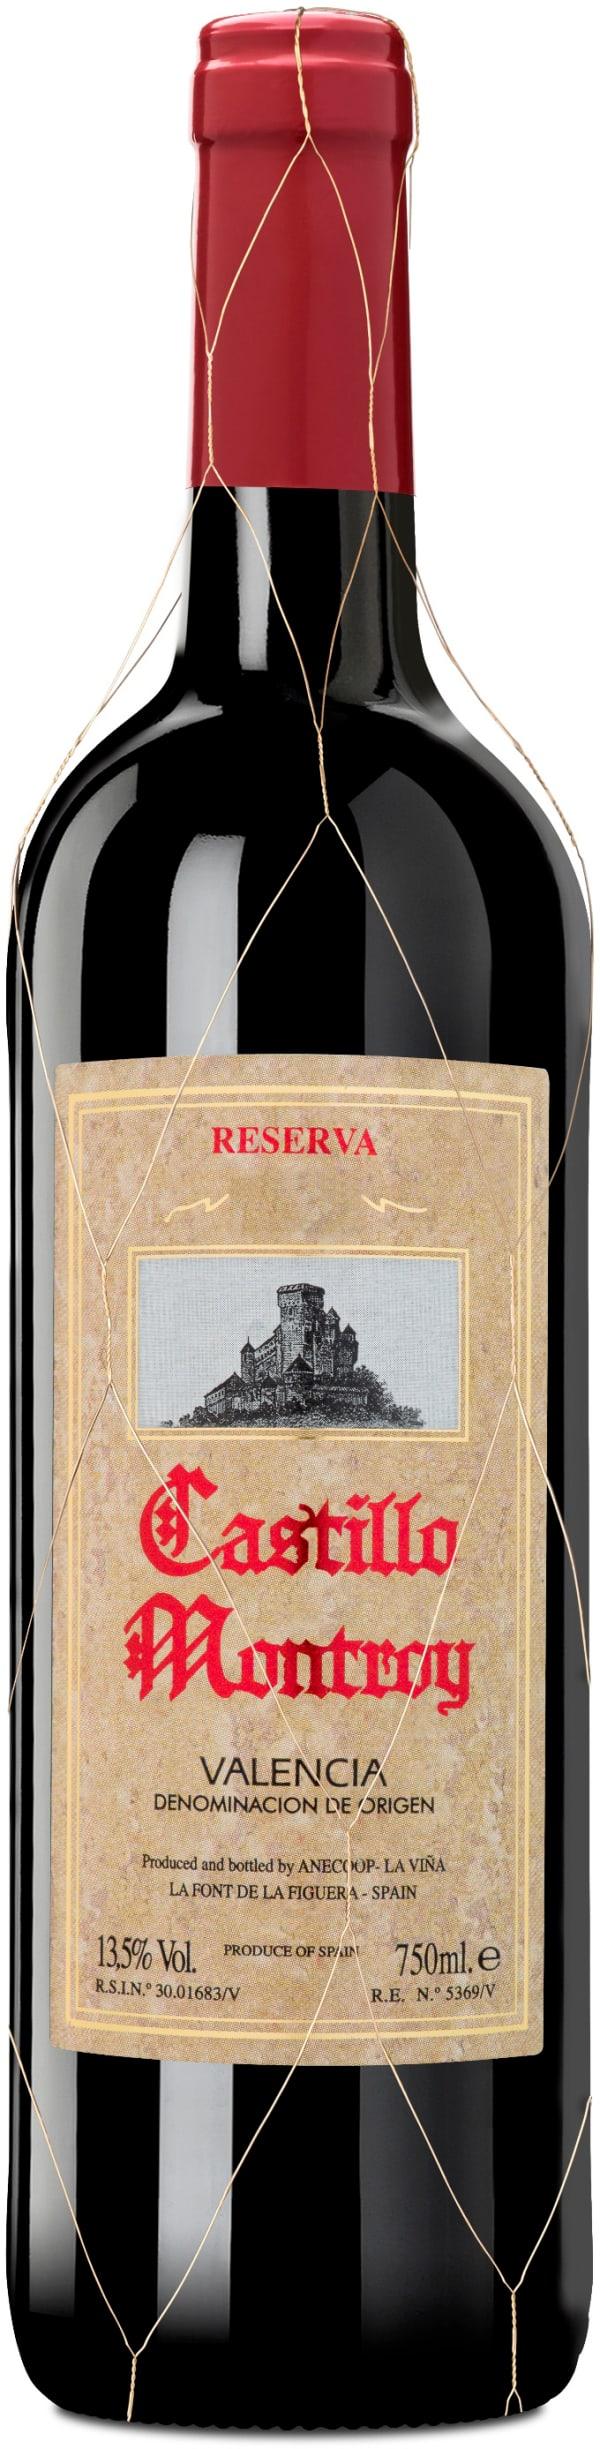 Castillo Montroy Reserva 2015